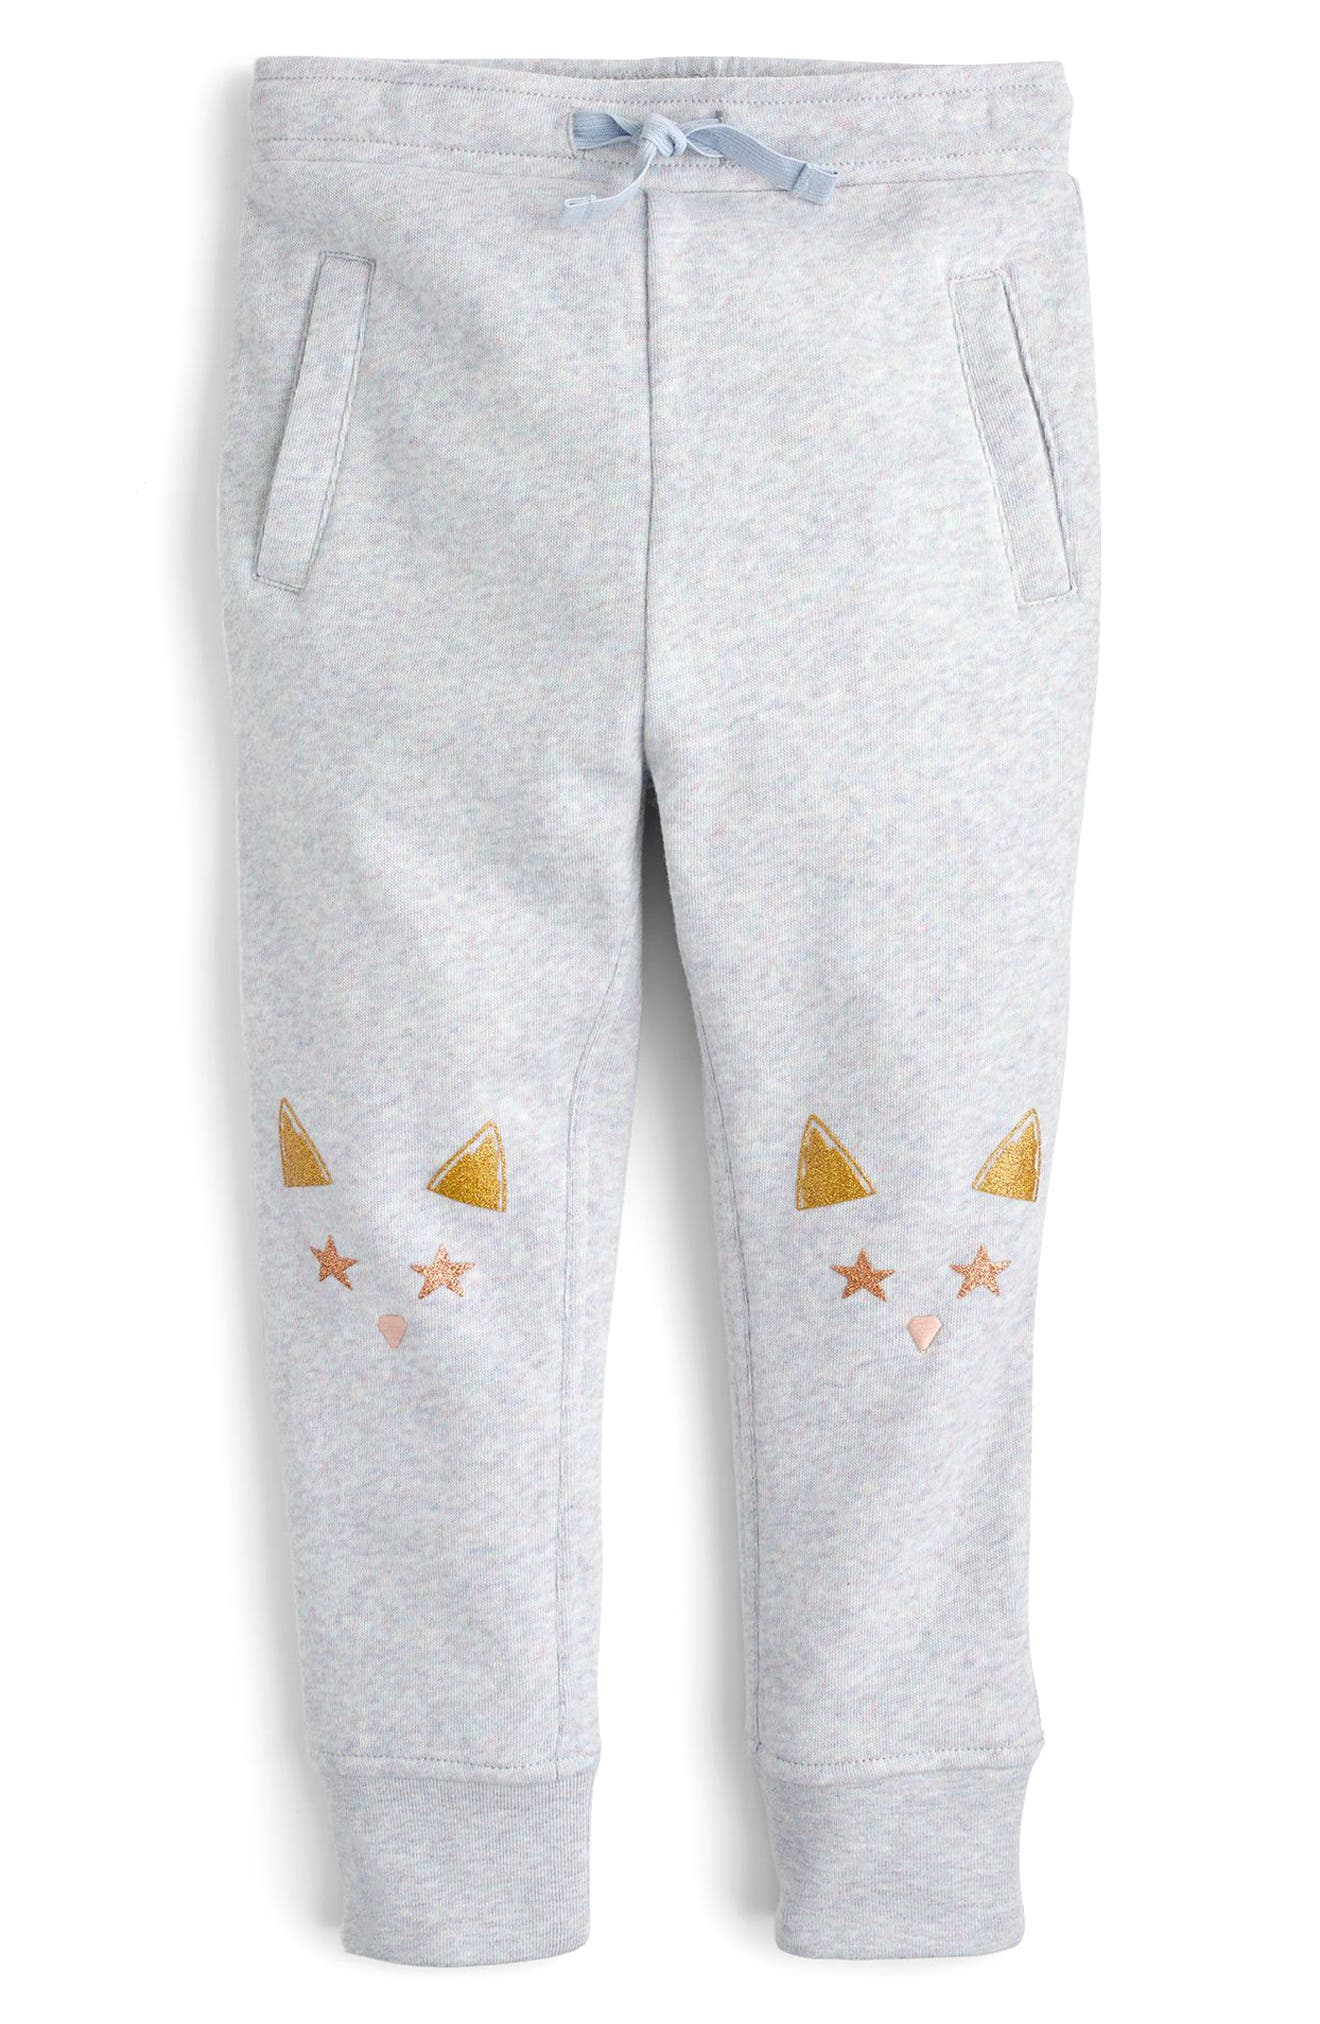 Cat Knee Sweatpants,                             Main thumbnail 1, color,                             Peri Jasmine Multi